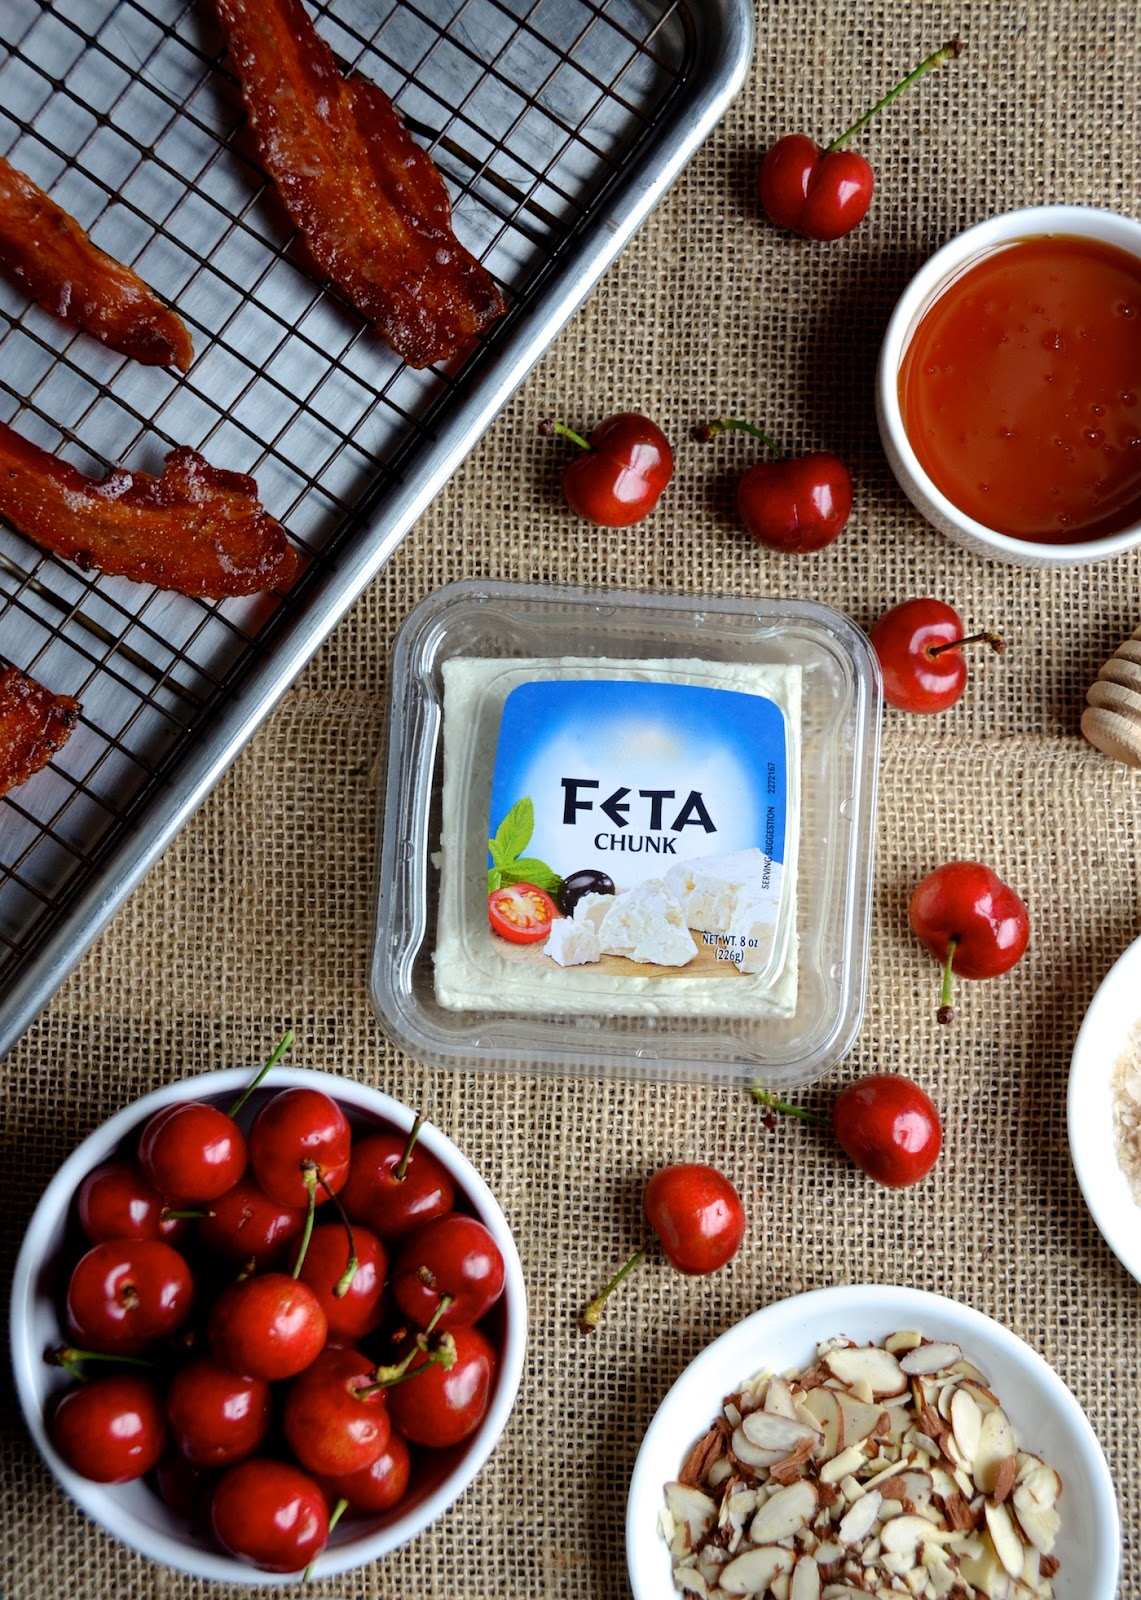 Baked Feta with Cherry, Bacon & Almonds - Always Order Dessert